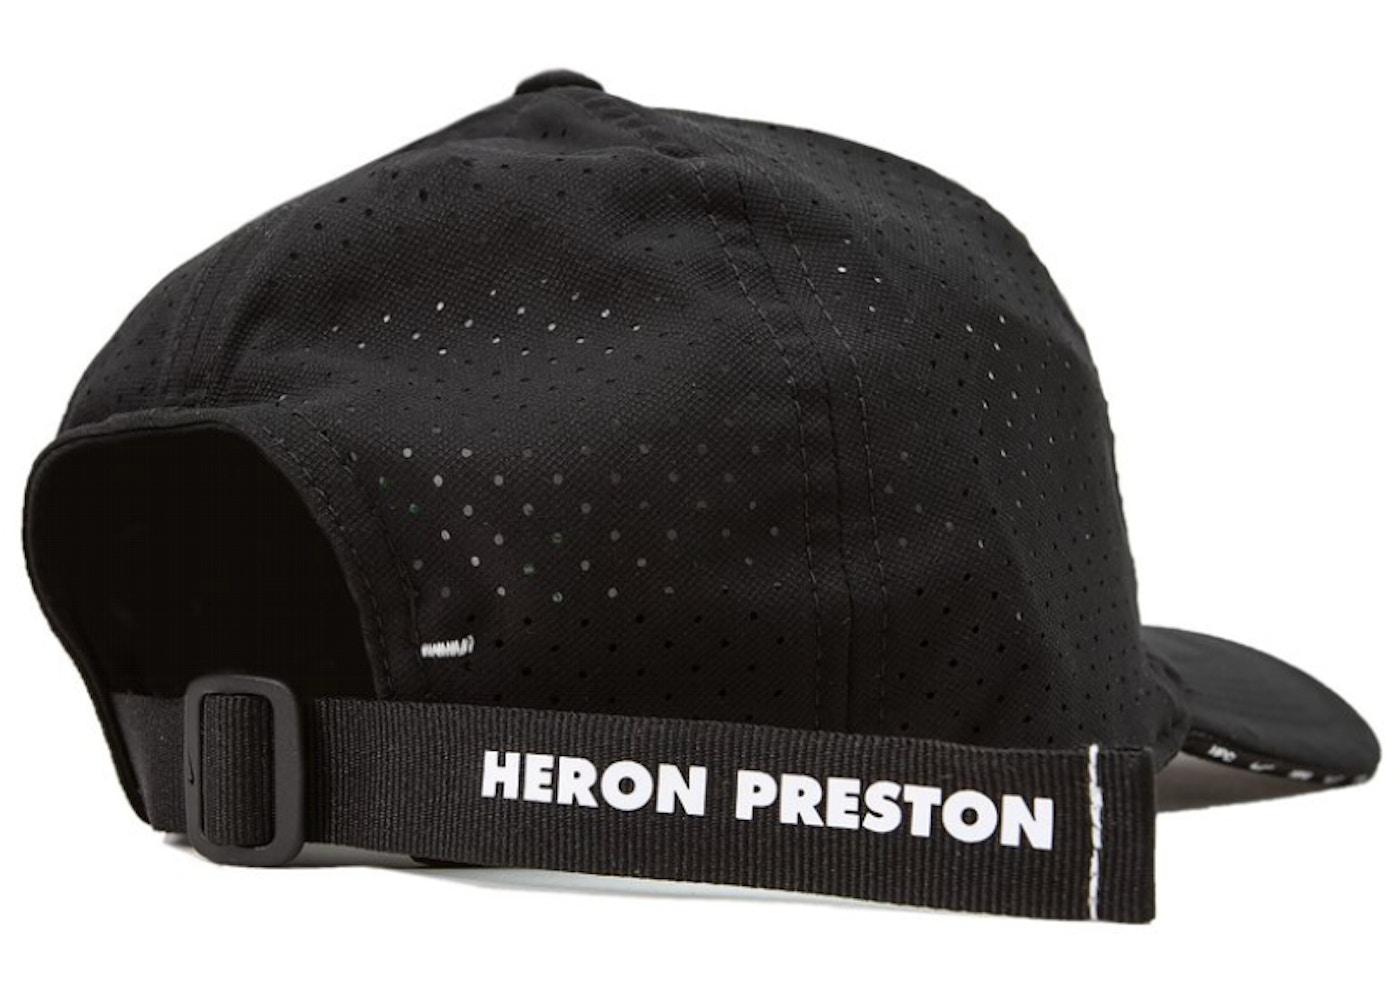 Nike x Heron Preston NRG H86 Hat Black - SS19 9996860a0c9